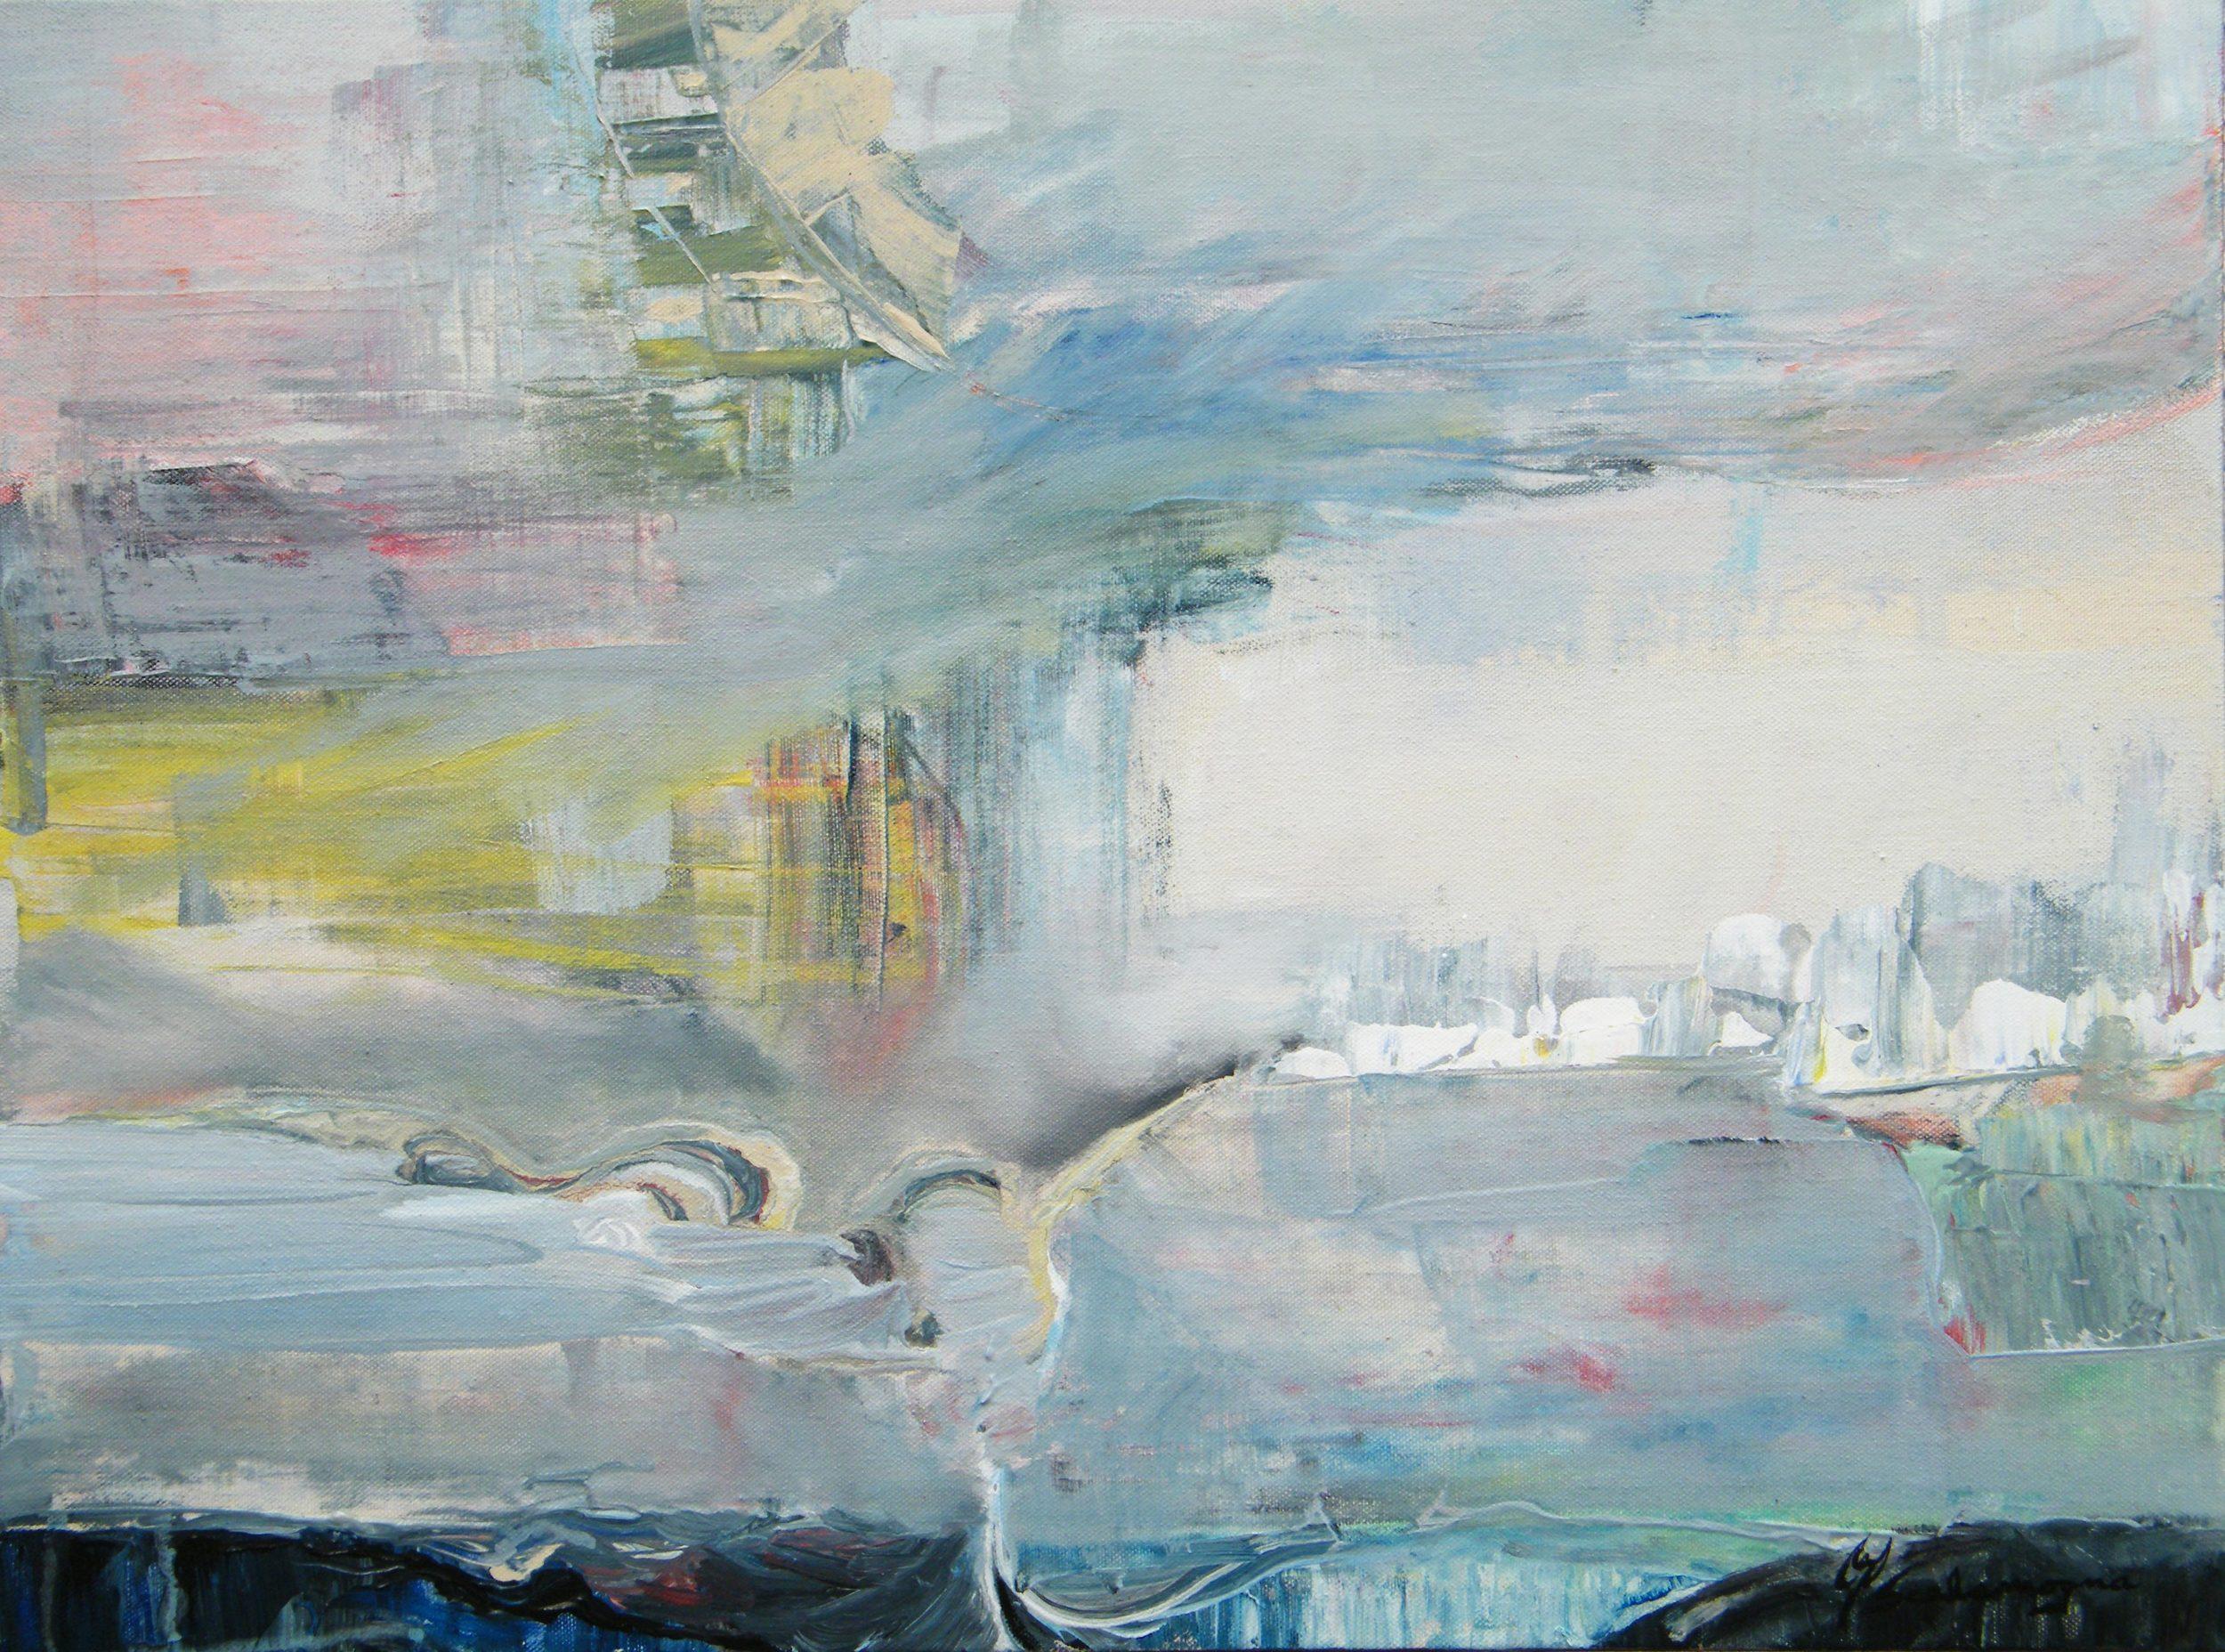 On the Horizon - 18 x 24, Acrylic on Canvas.